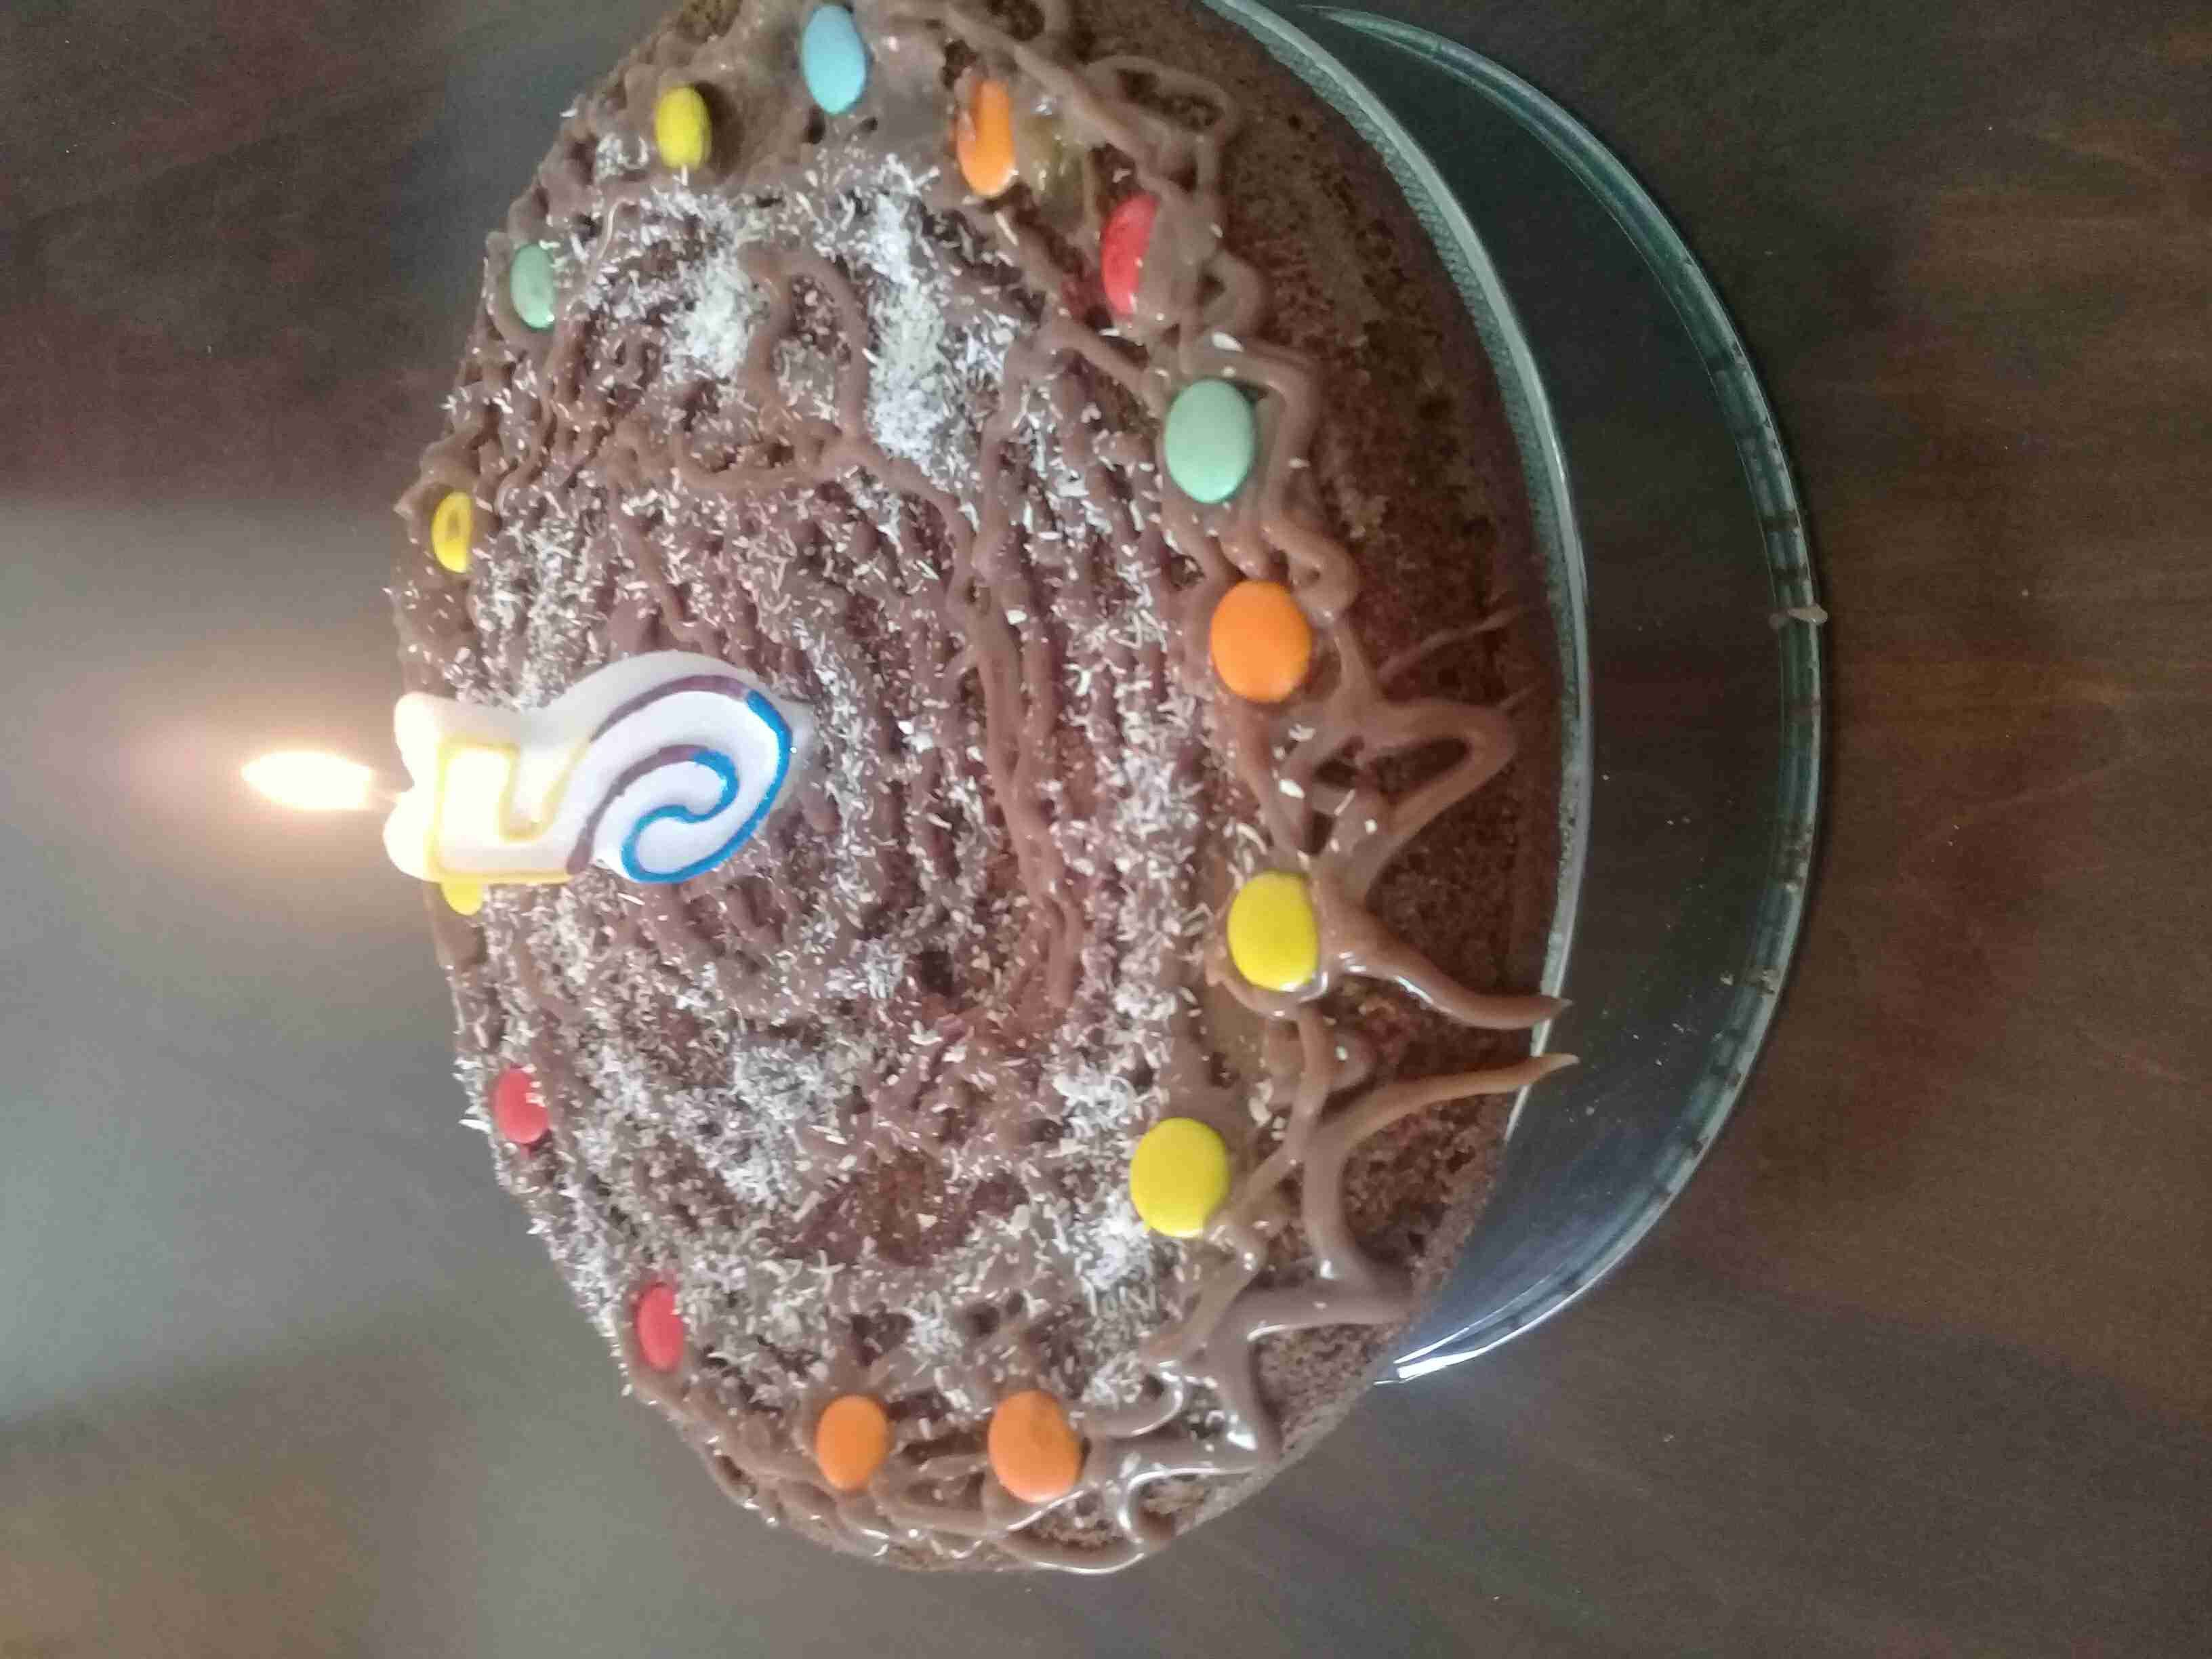 كيكه شوكولاته بسيطه مسابقه ملكه الكيكات زاكي Chocolate Desserts Pudding